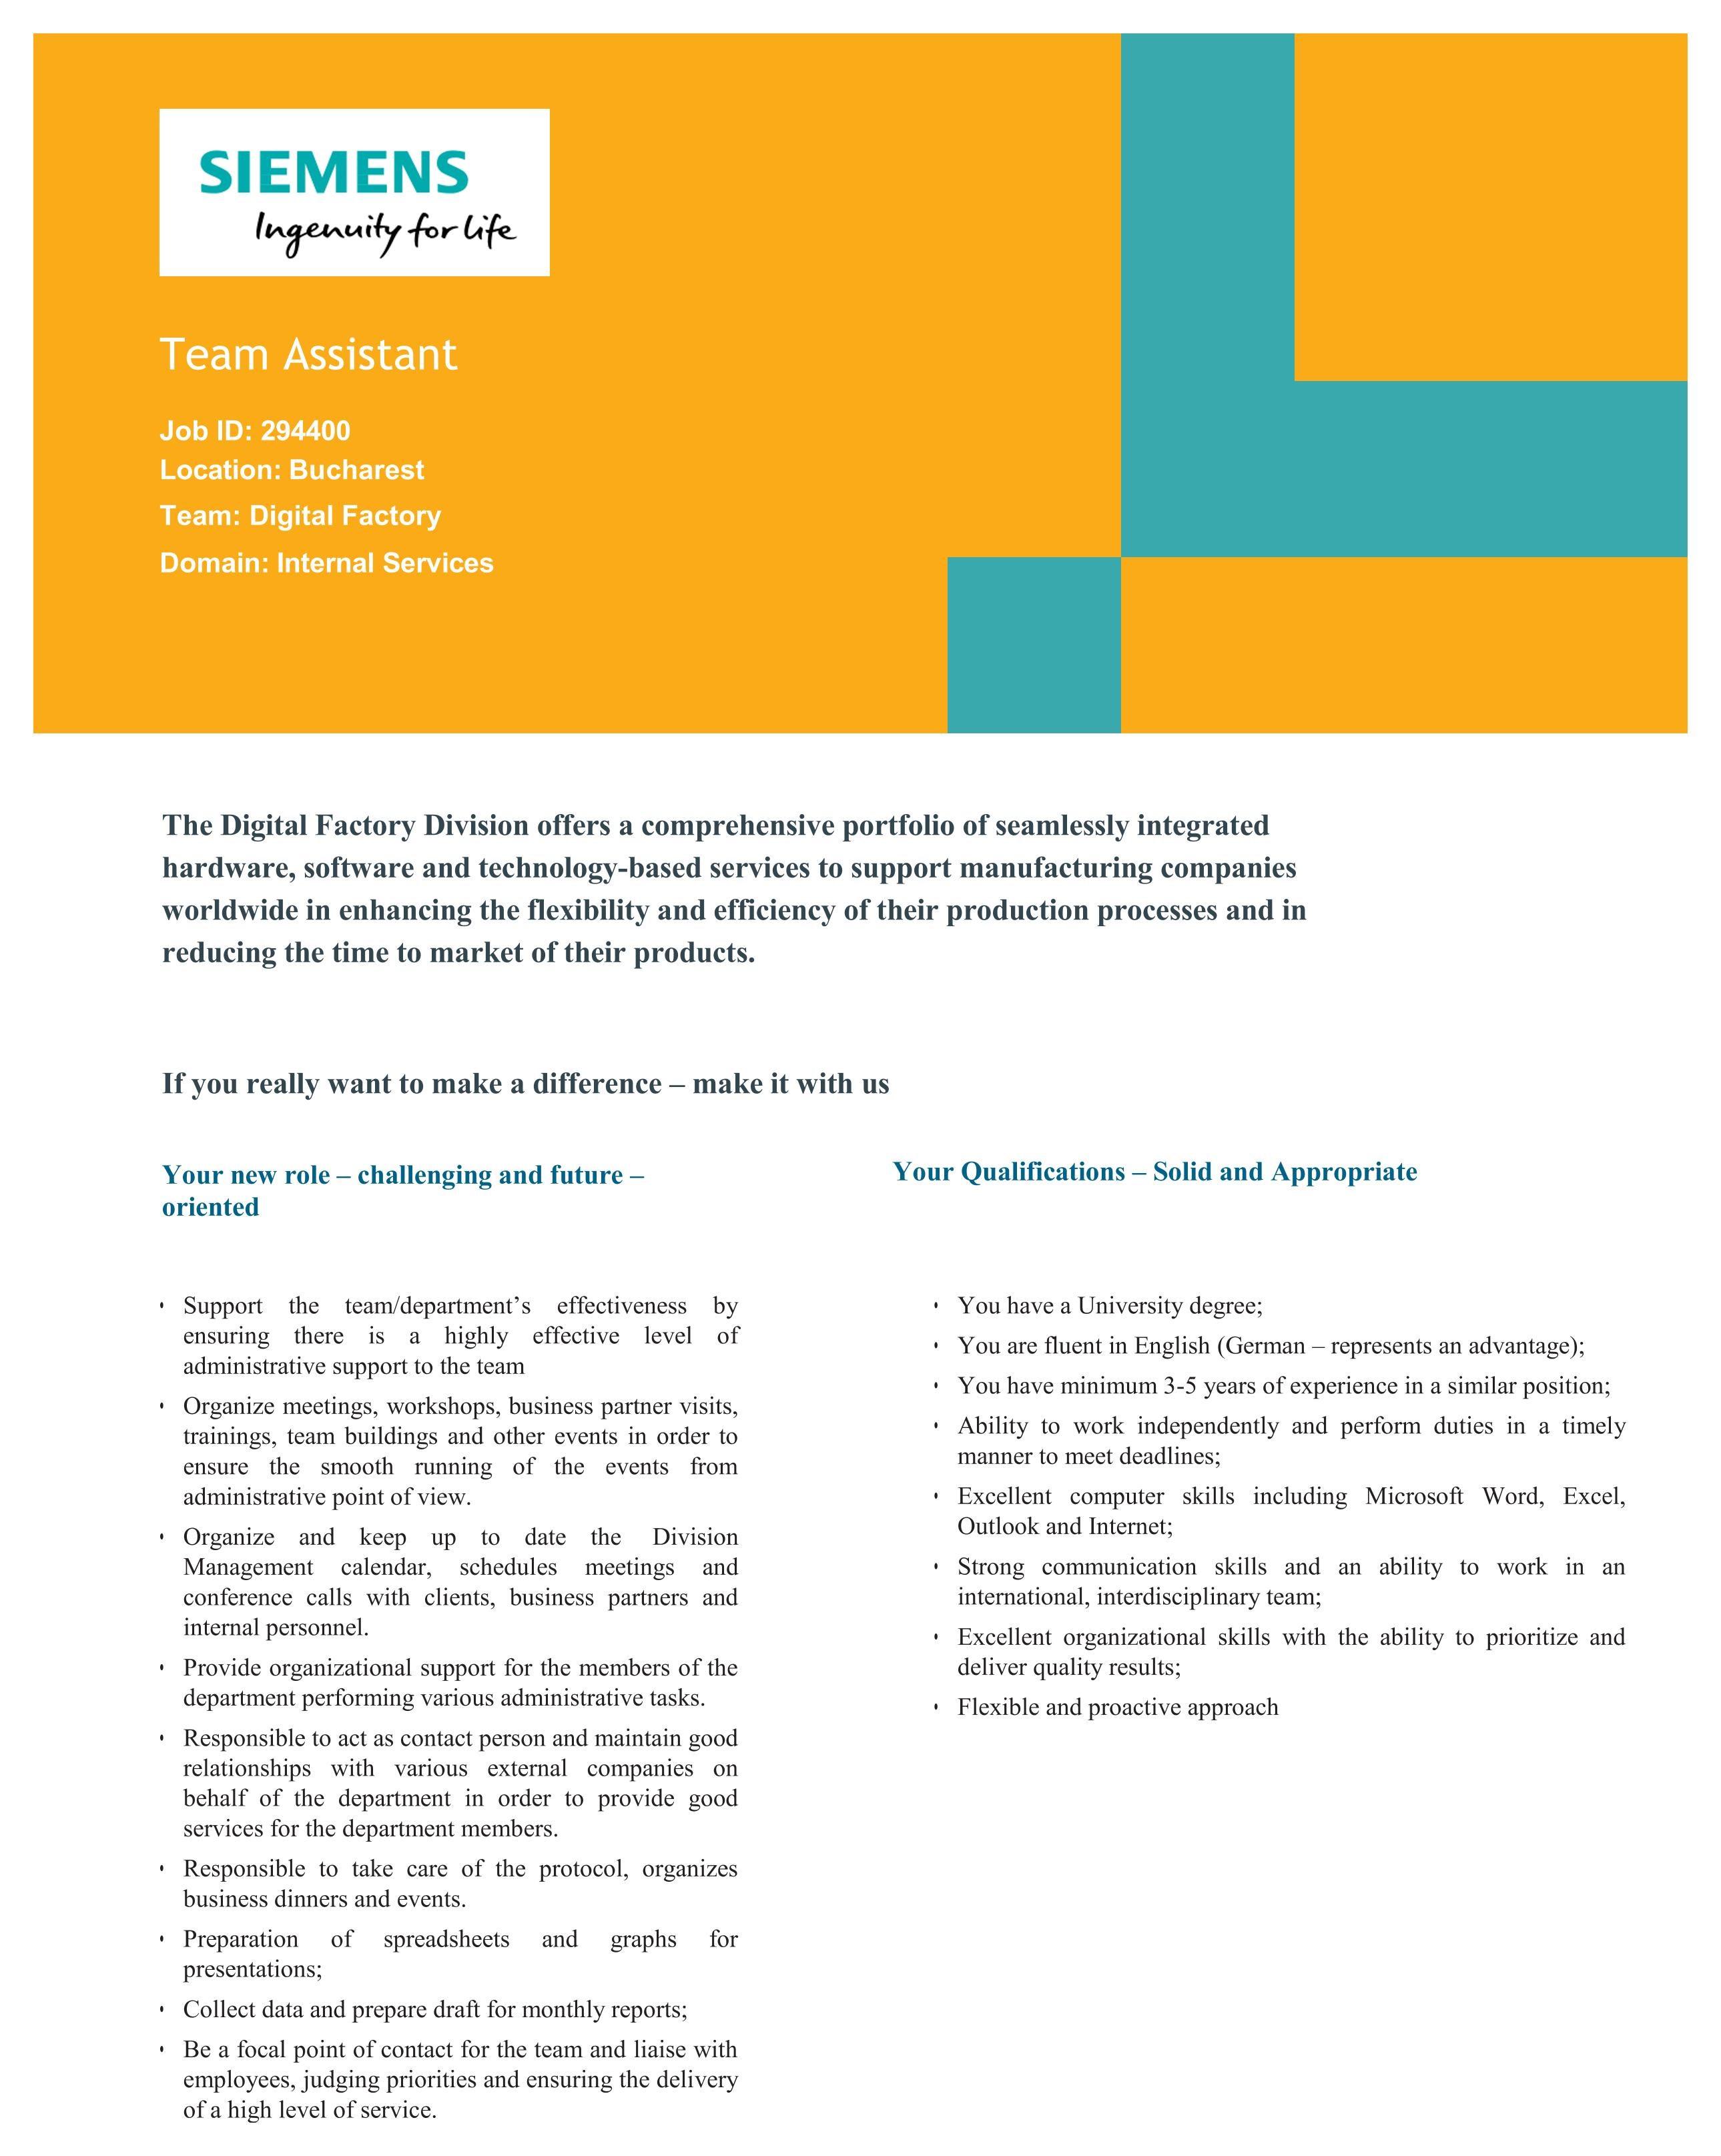 Team Asisstant DF .pdf